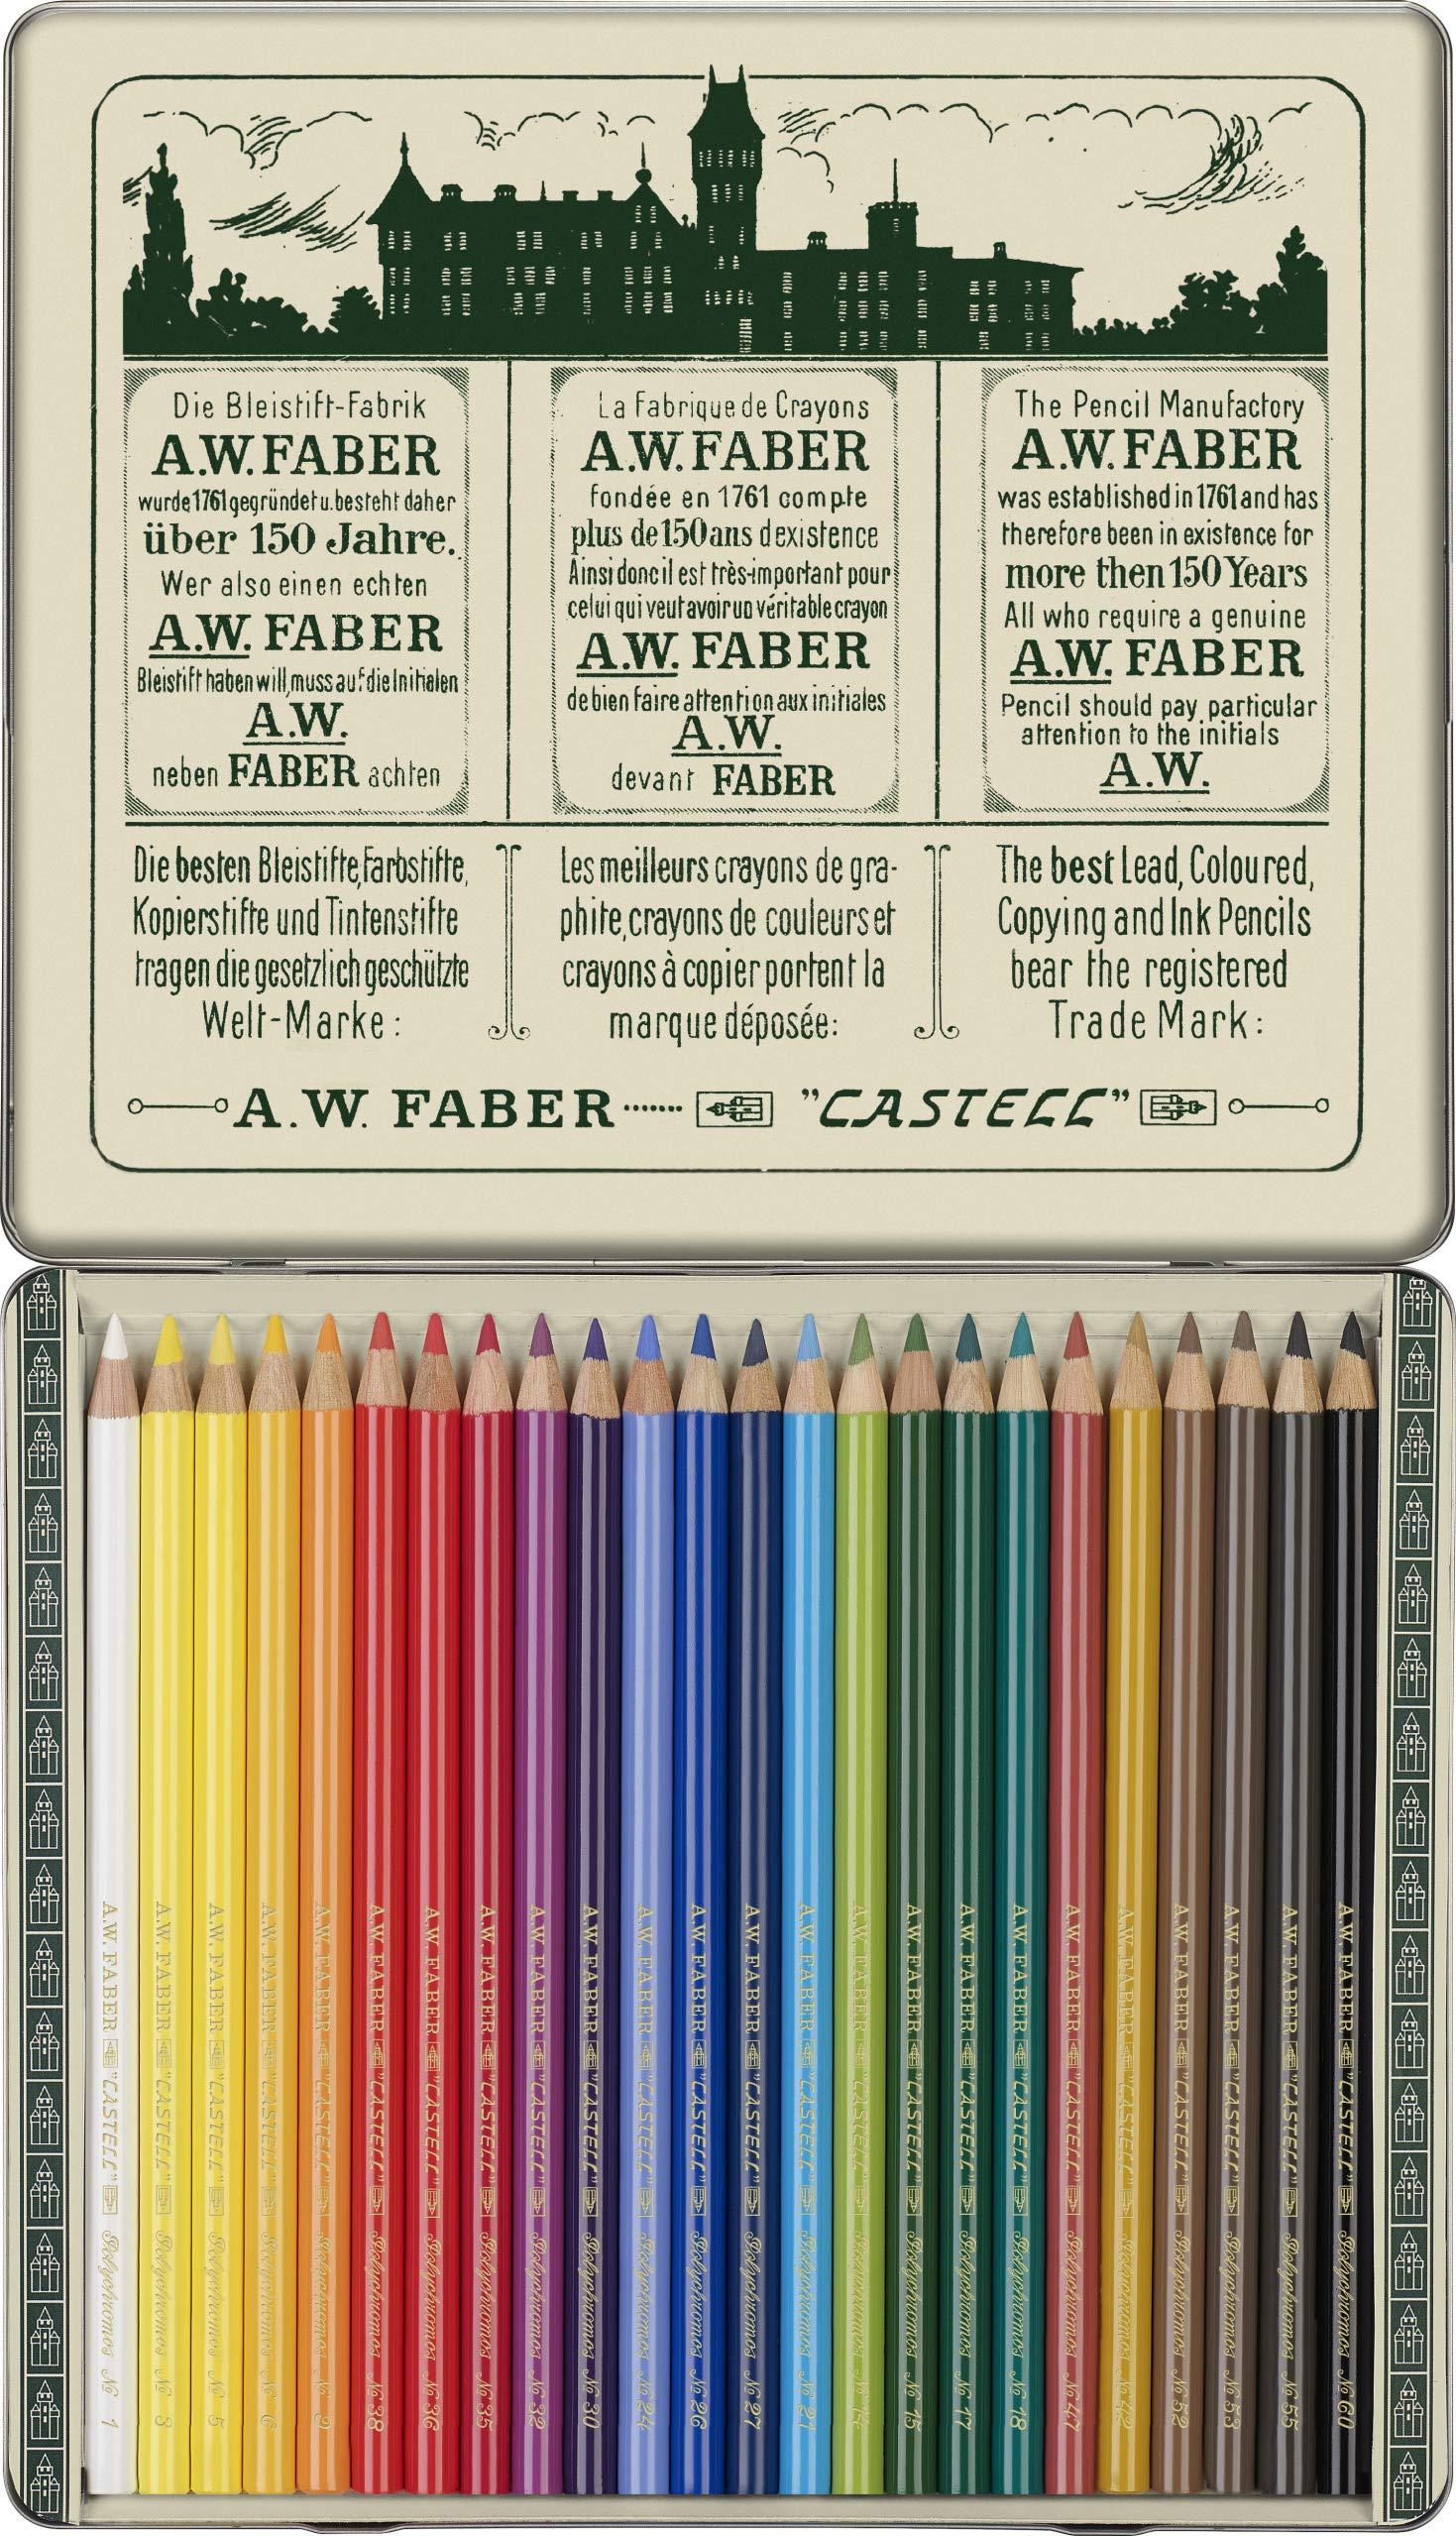 Faber-Castell 211002 – Estuche de metal con 24 lápices de colores Polychromos para artistas edición retro 111 aniversario.